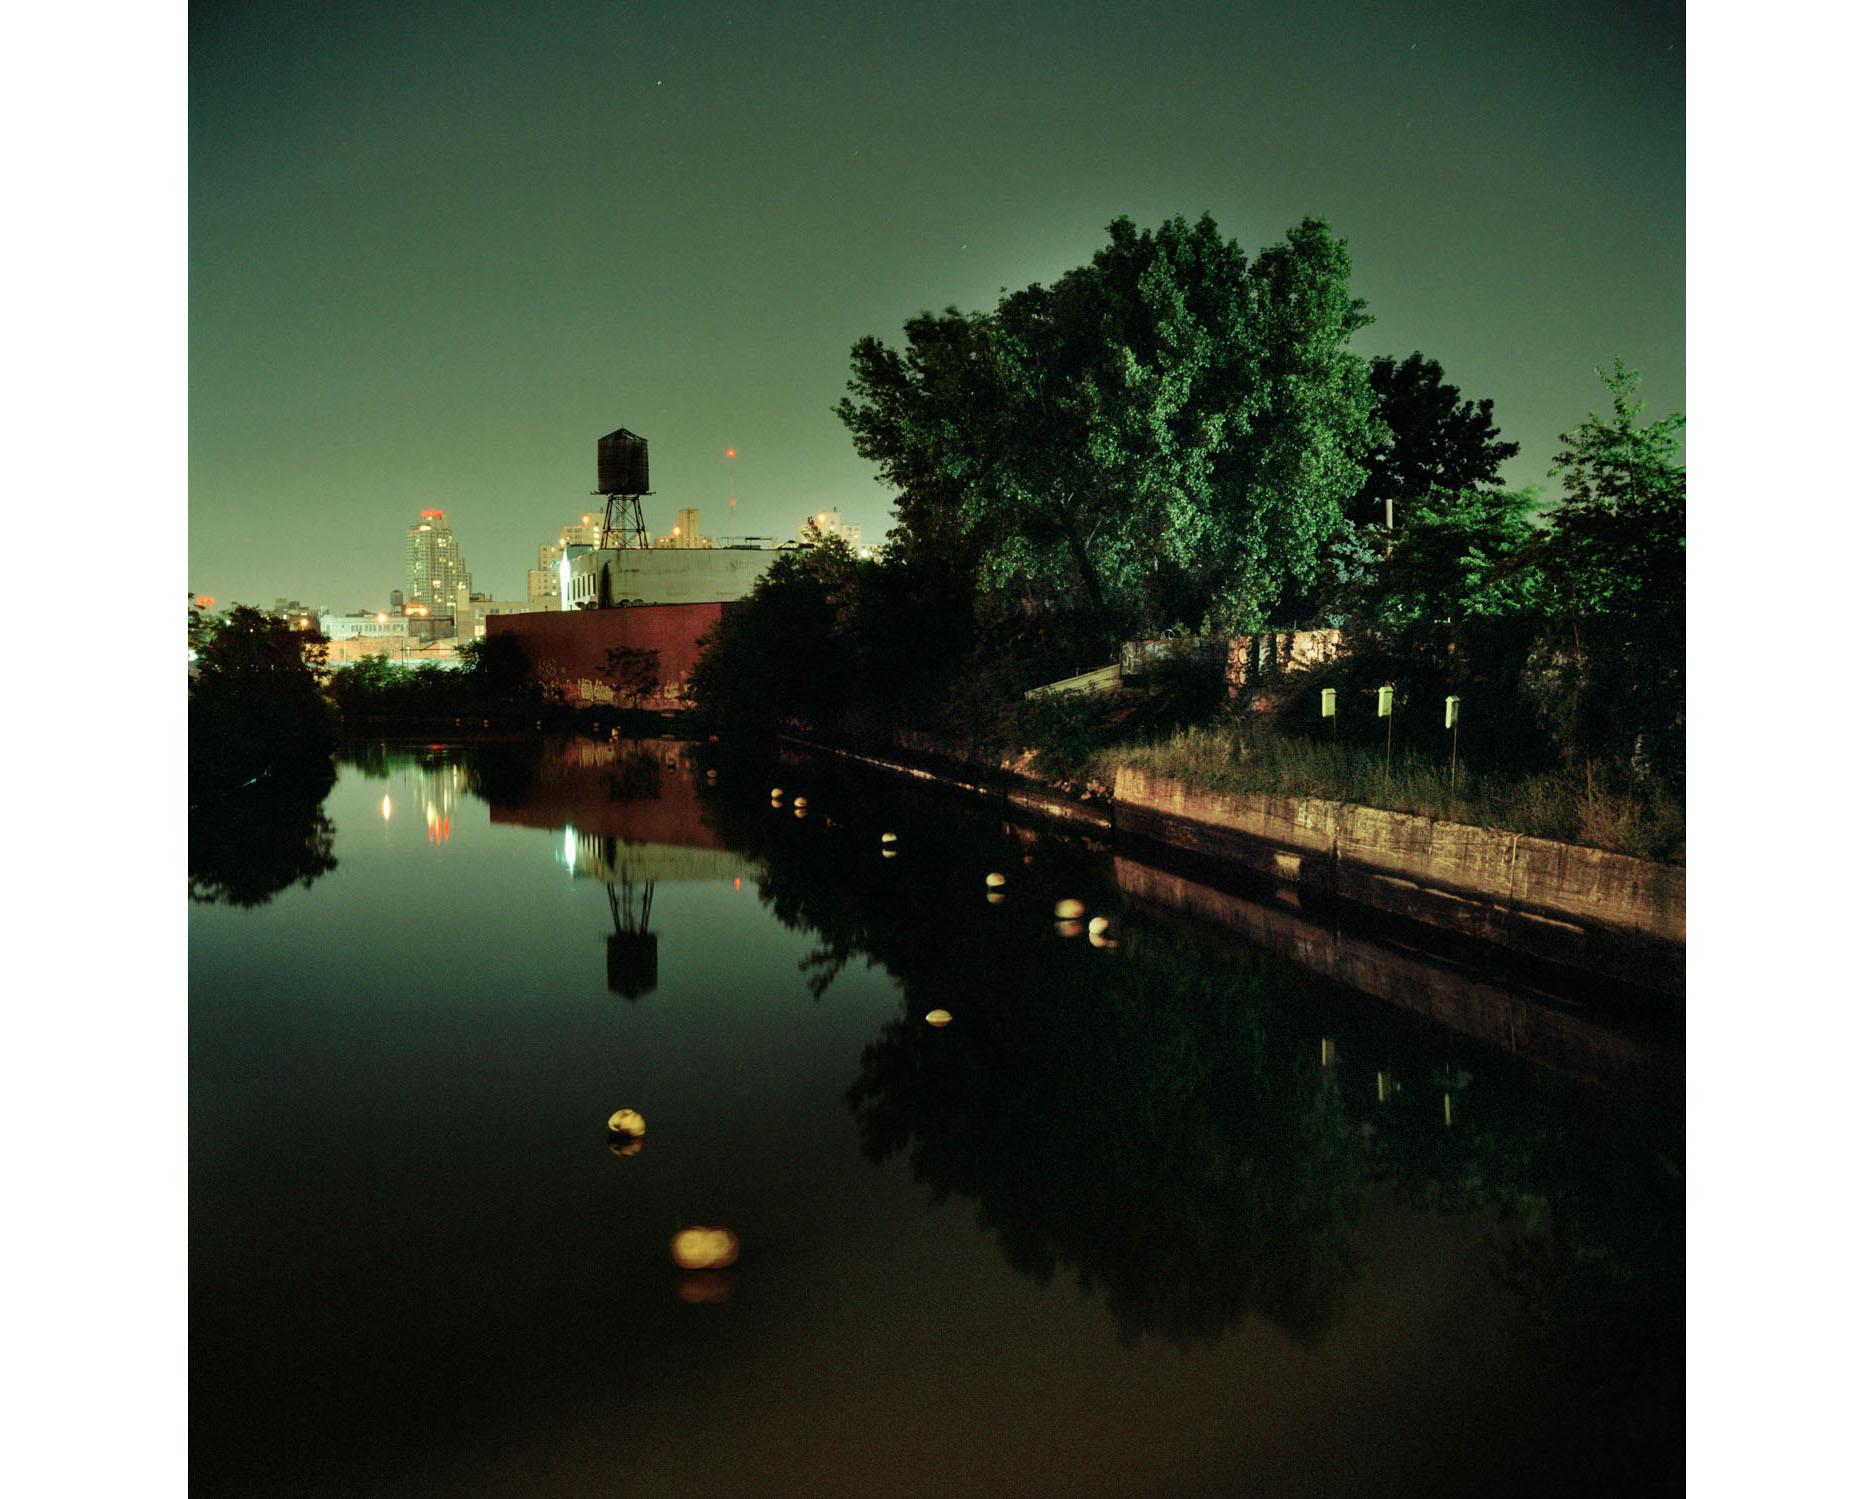 Miska_Draskoczy_Gowanus_Wild_green_canal rect2.jpg